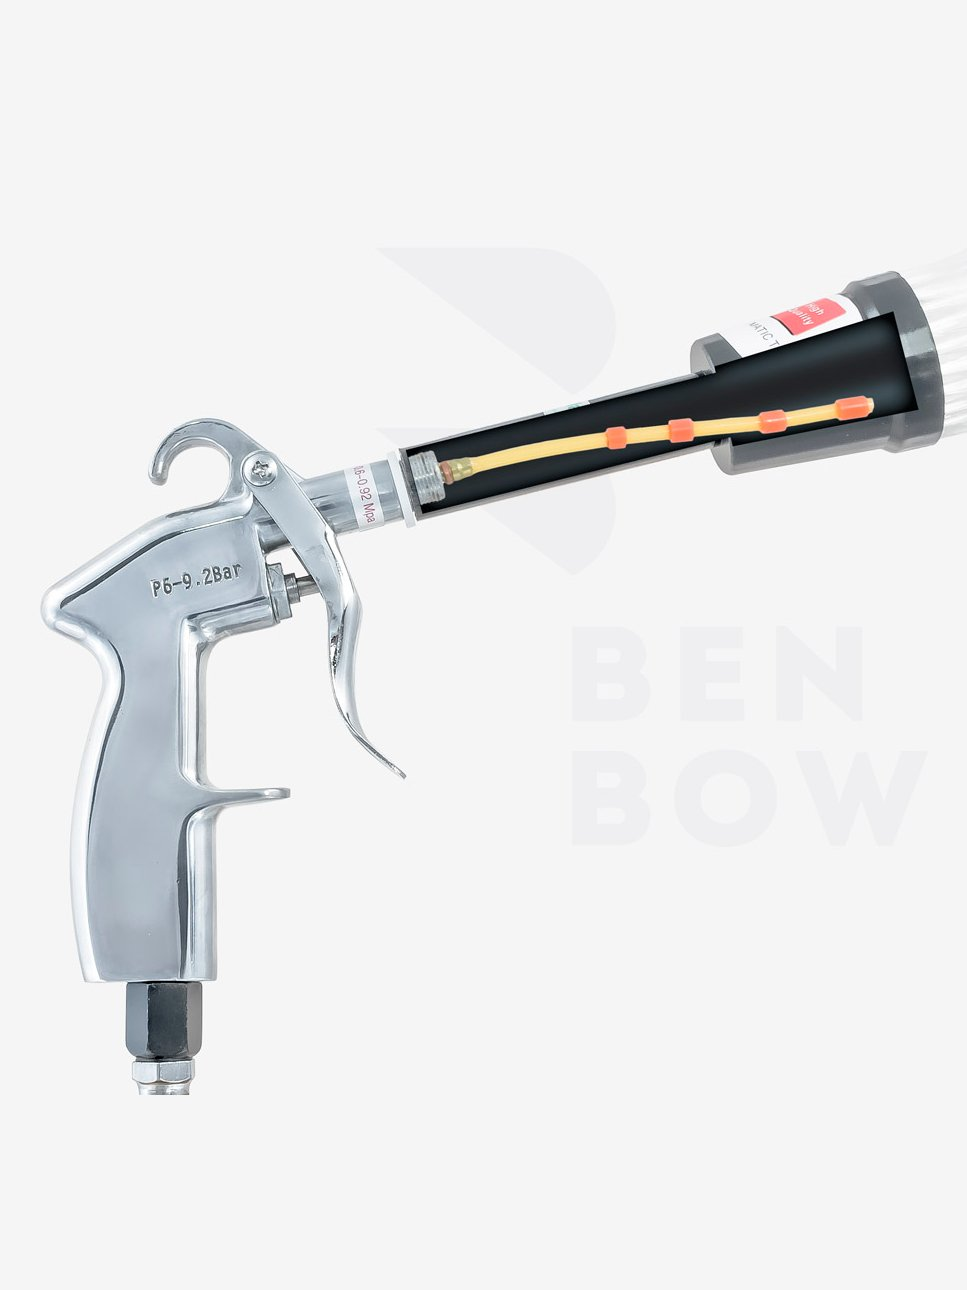 08 5 unidades Manguera roja 04 09 03 para pistola de limpieza Benbow 02